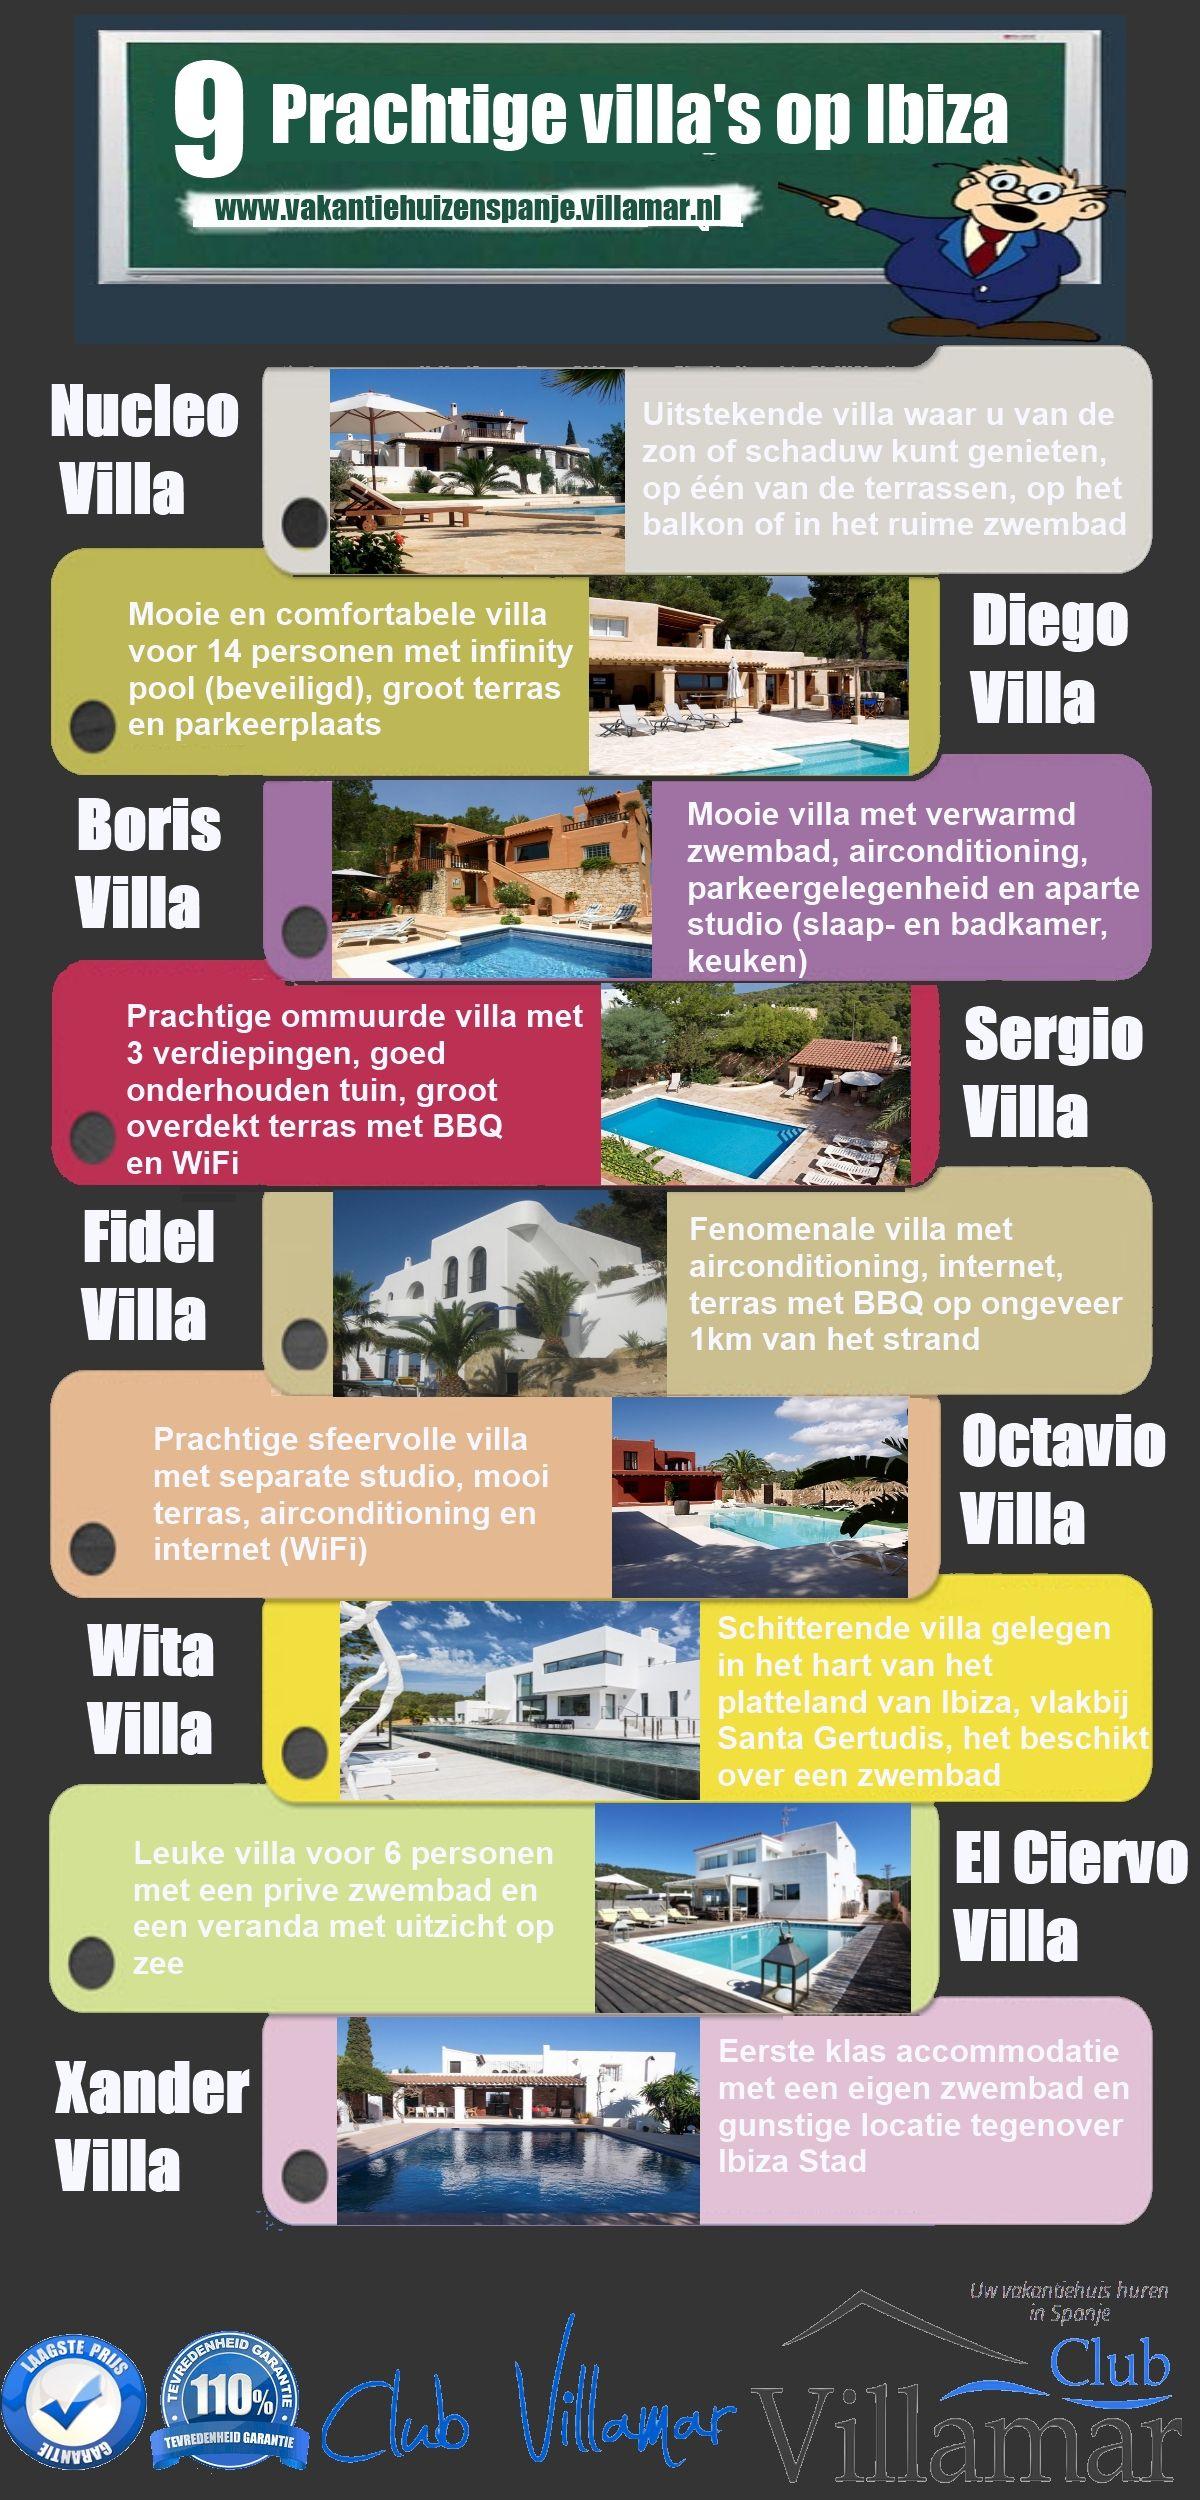 9 Prachtige villa's op spanje villa